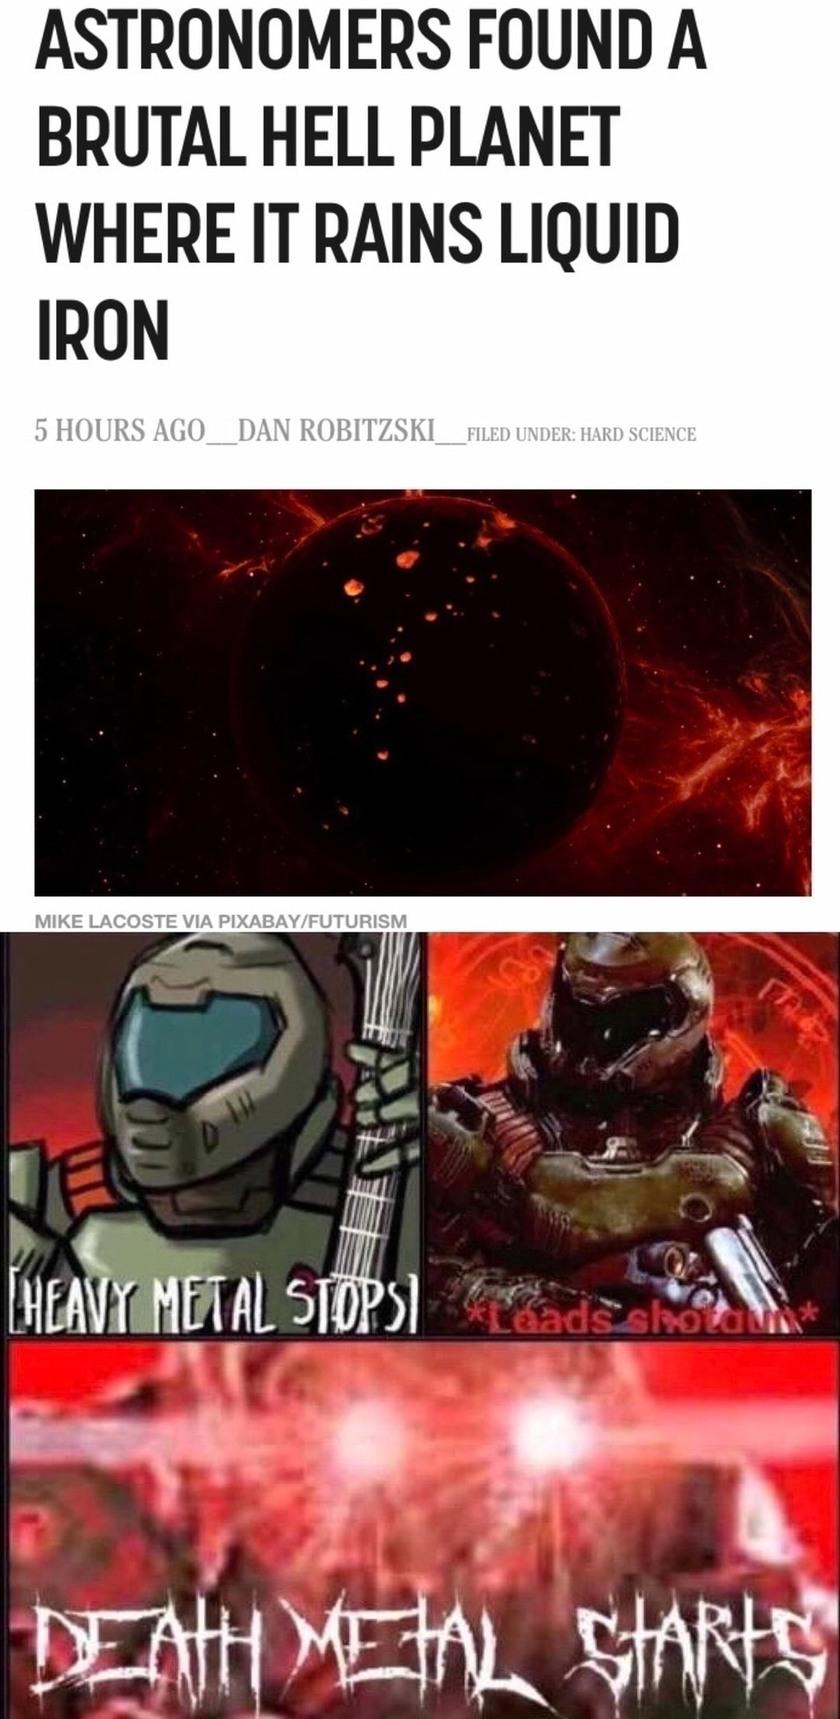 Njsjsndnzlzskns - meme